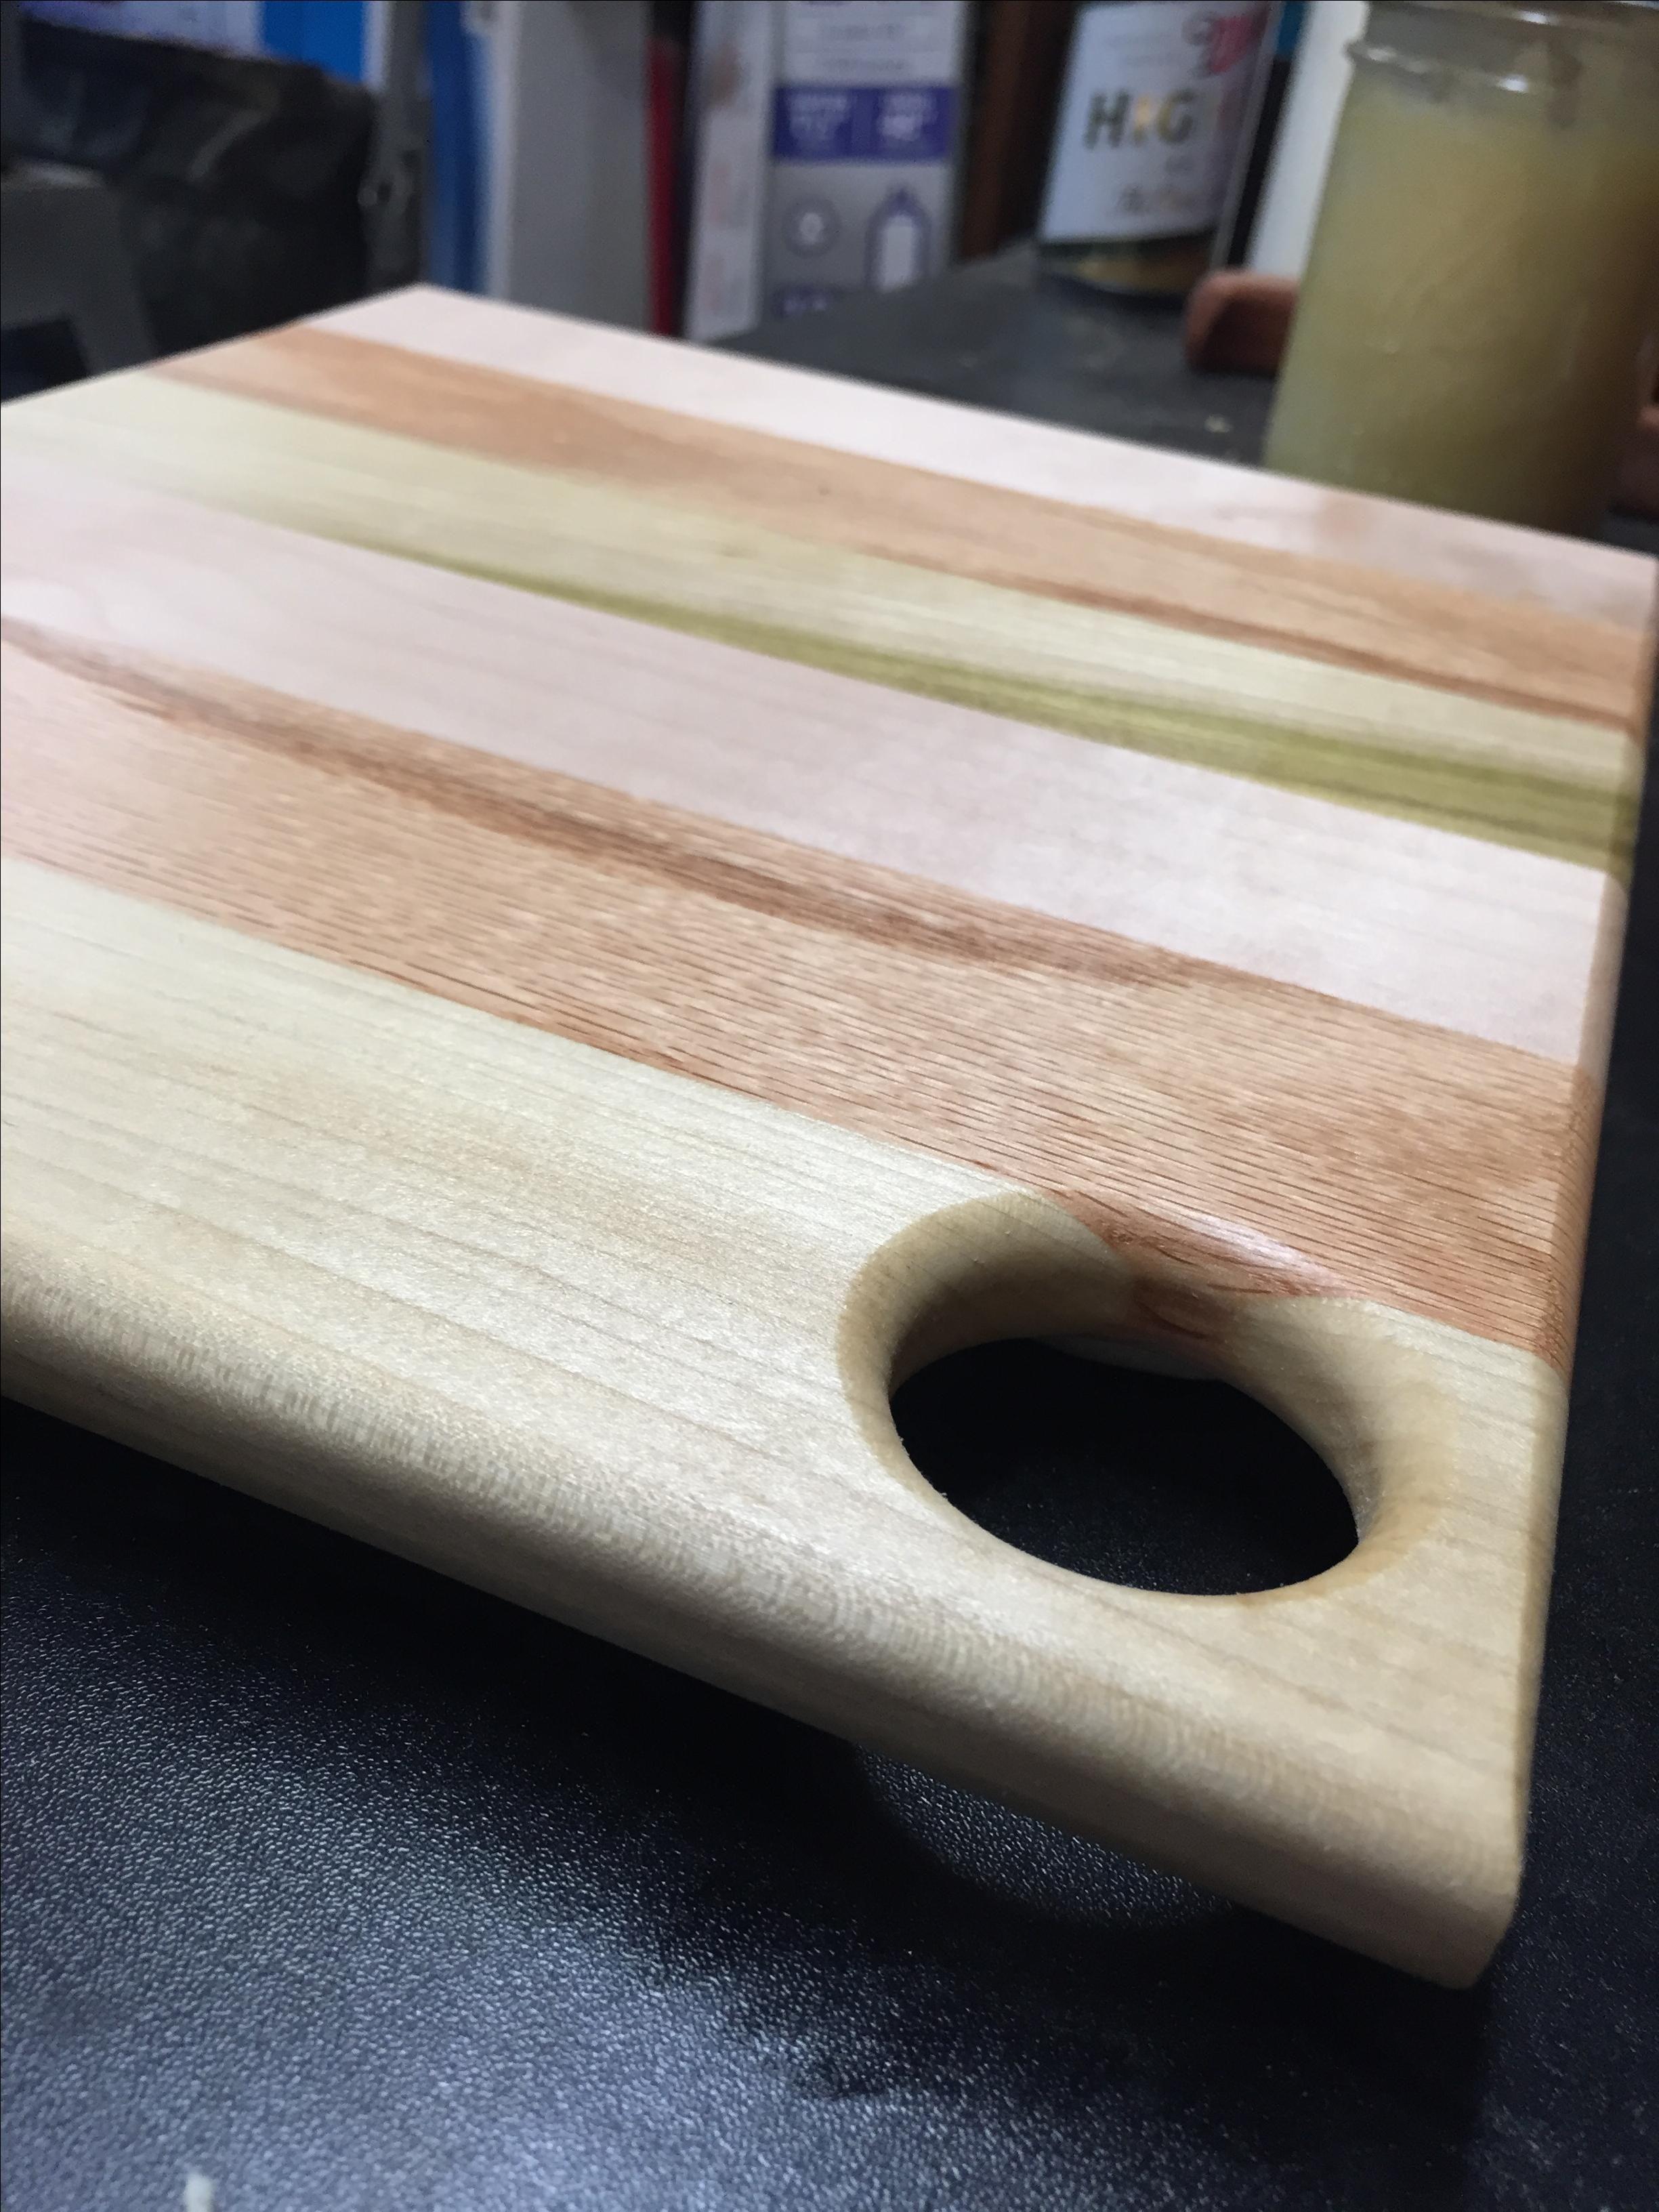 Handmade Custom Cutting Board By Hh Co Design Custommade Com